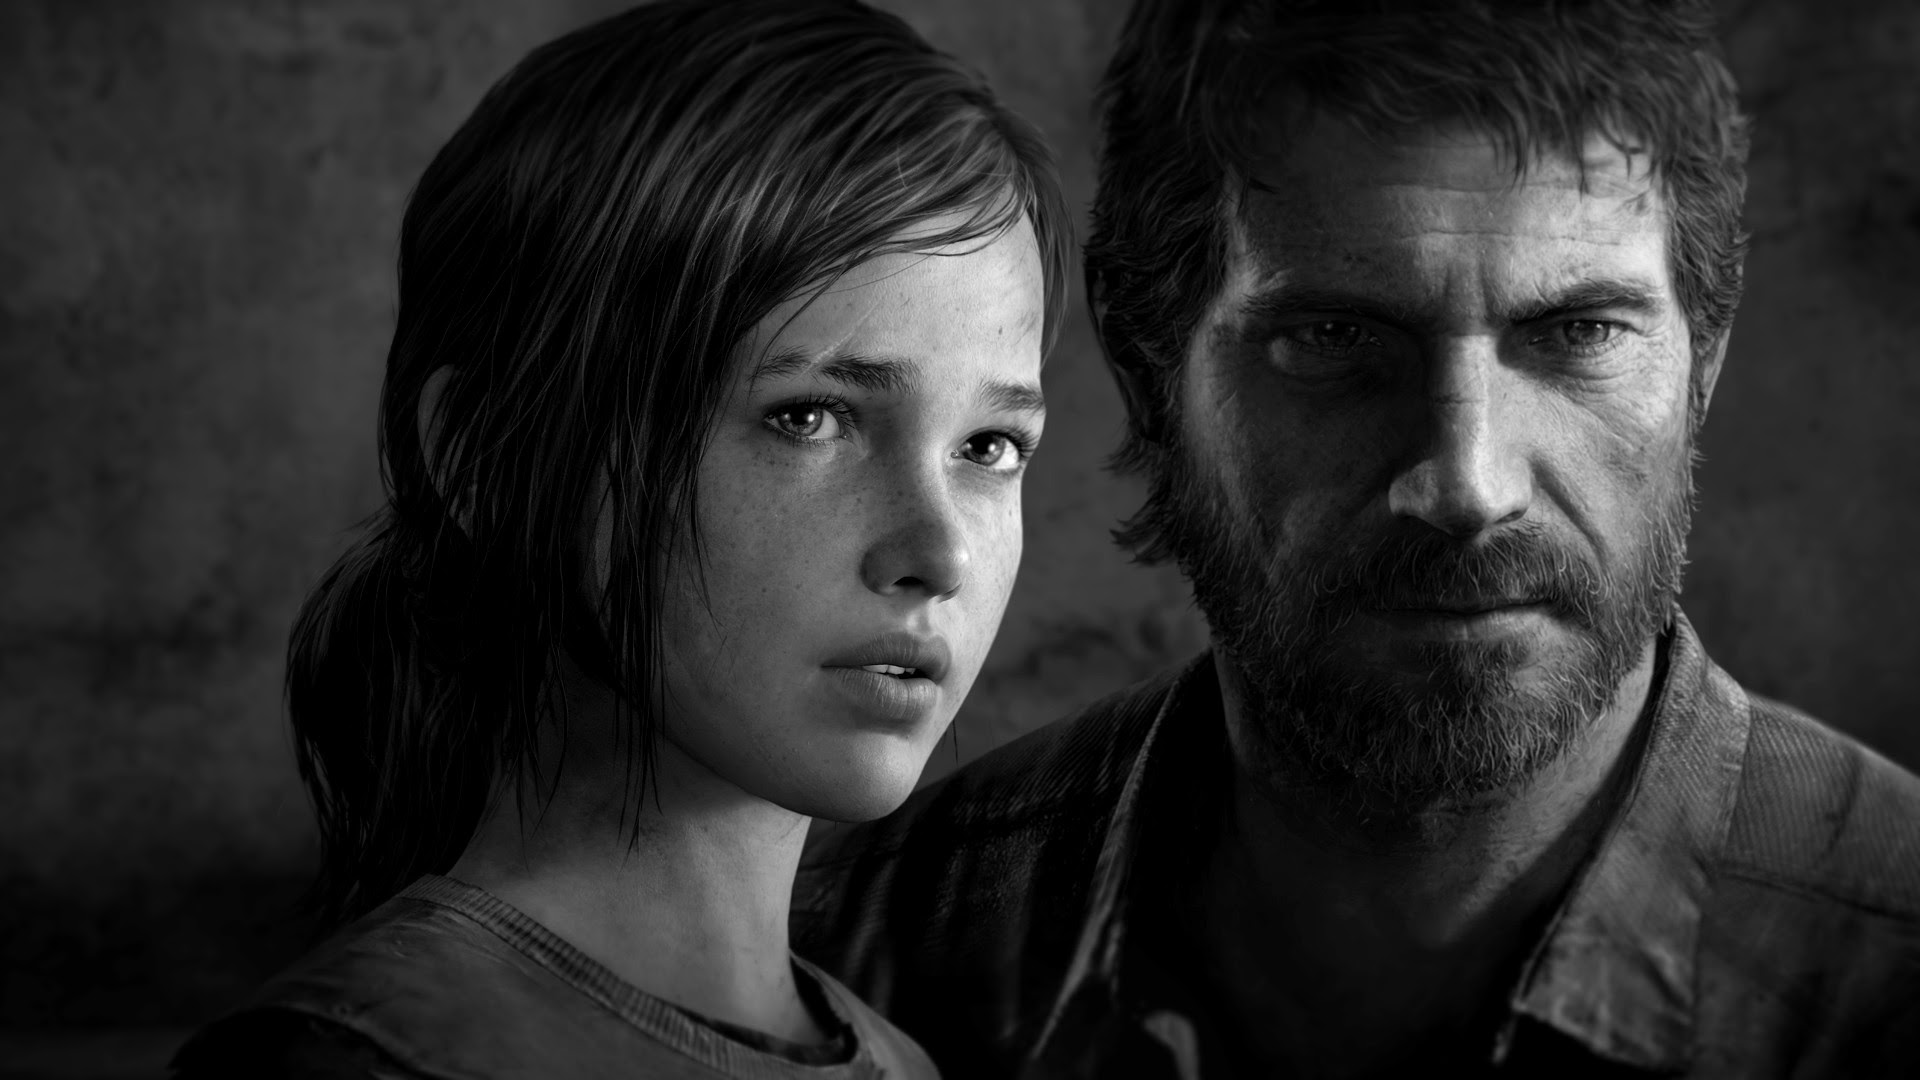 The Last Of Us Wallpaper 1920x1080 52745